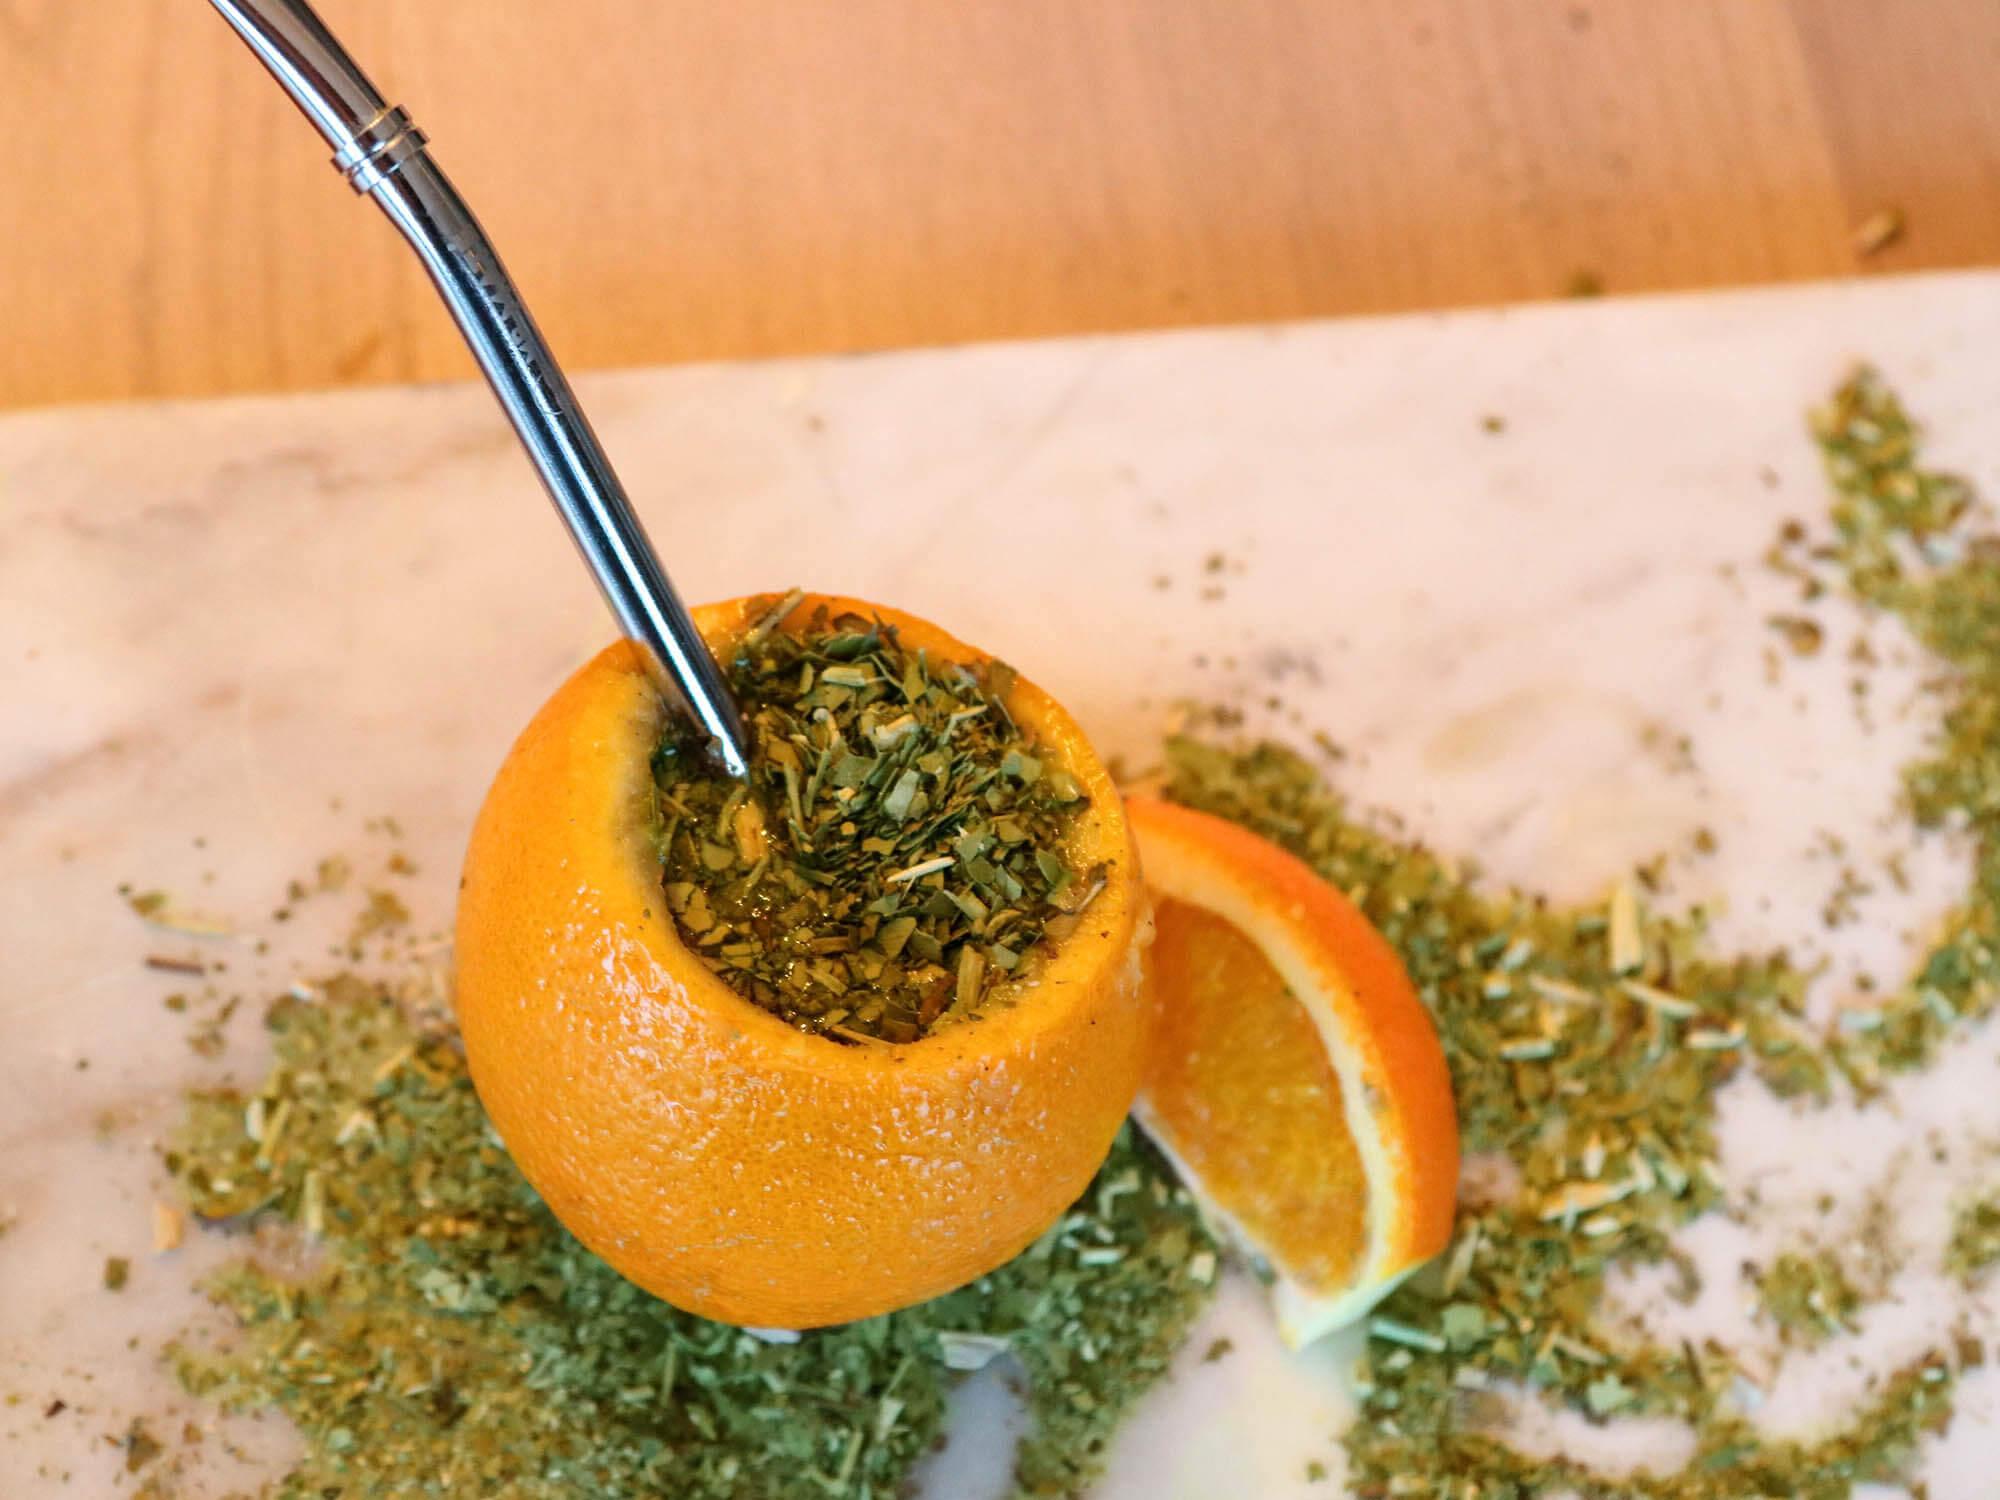 Mate sinaasappel Mate orange